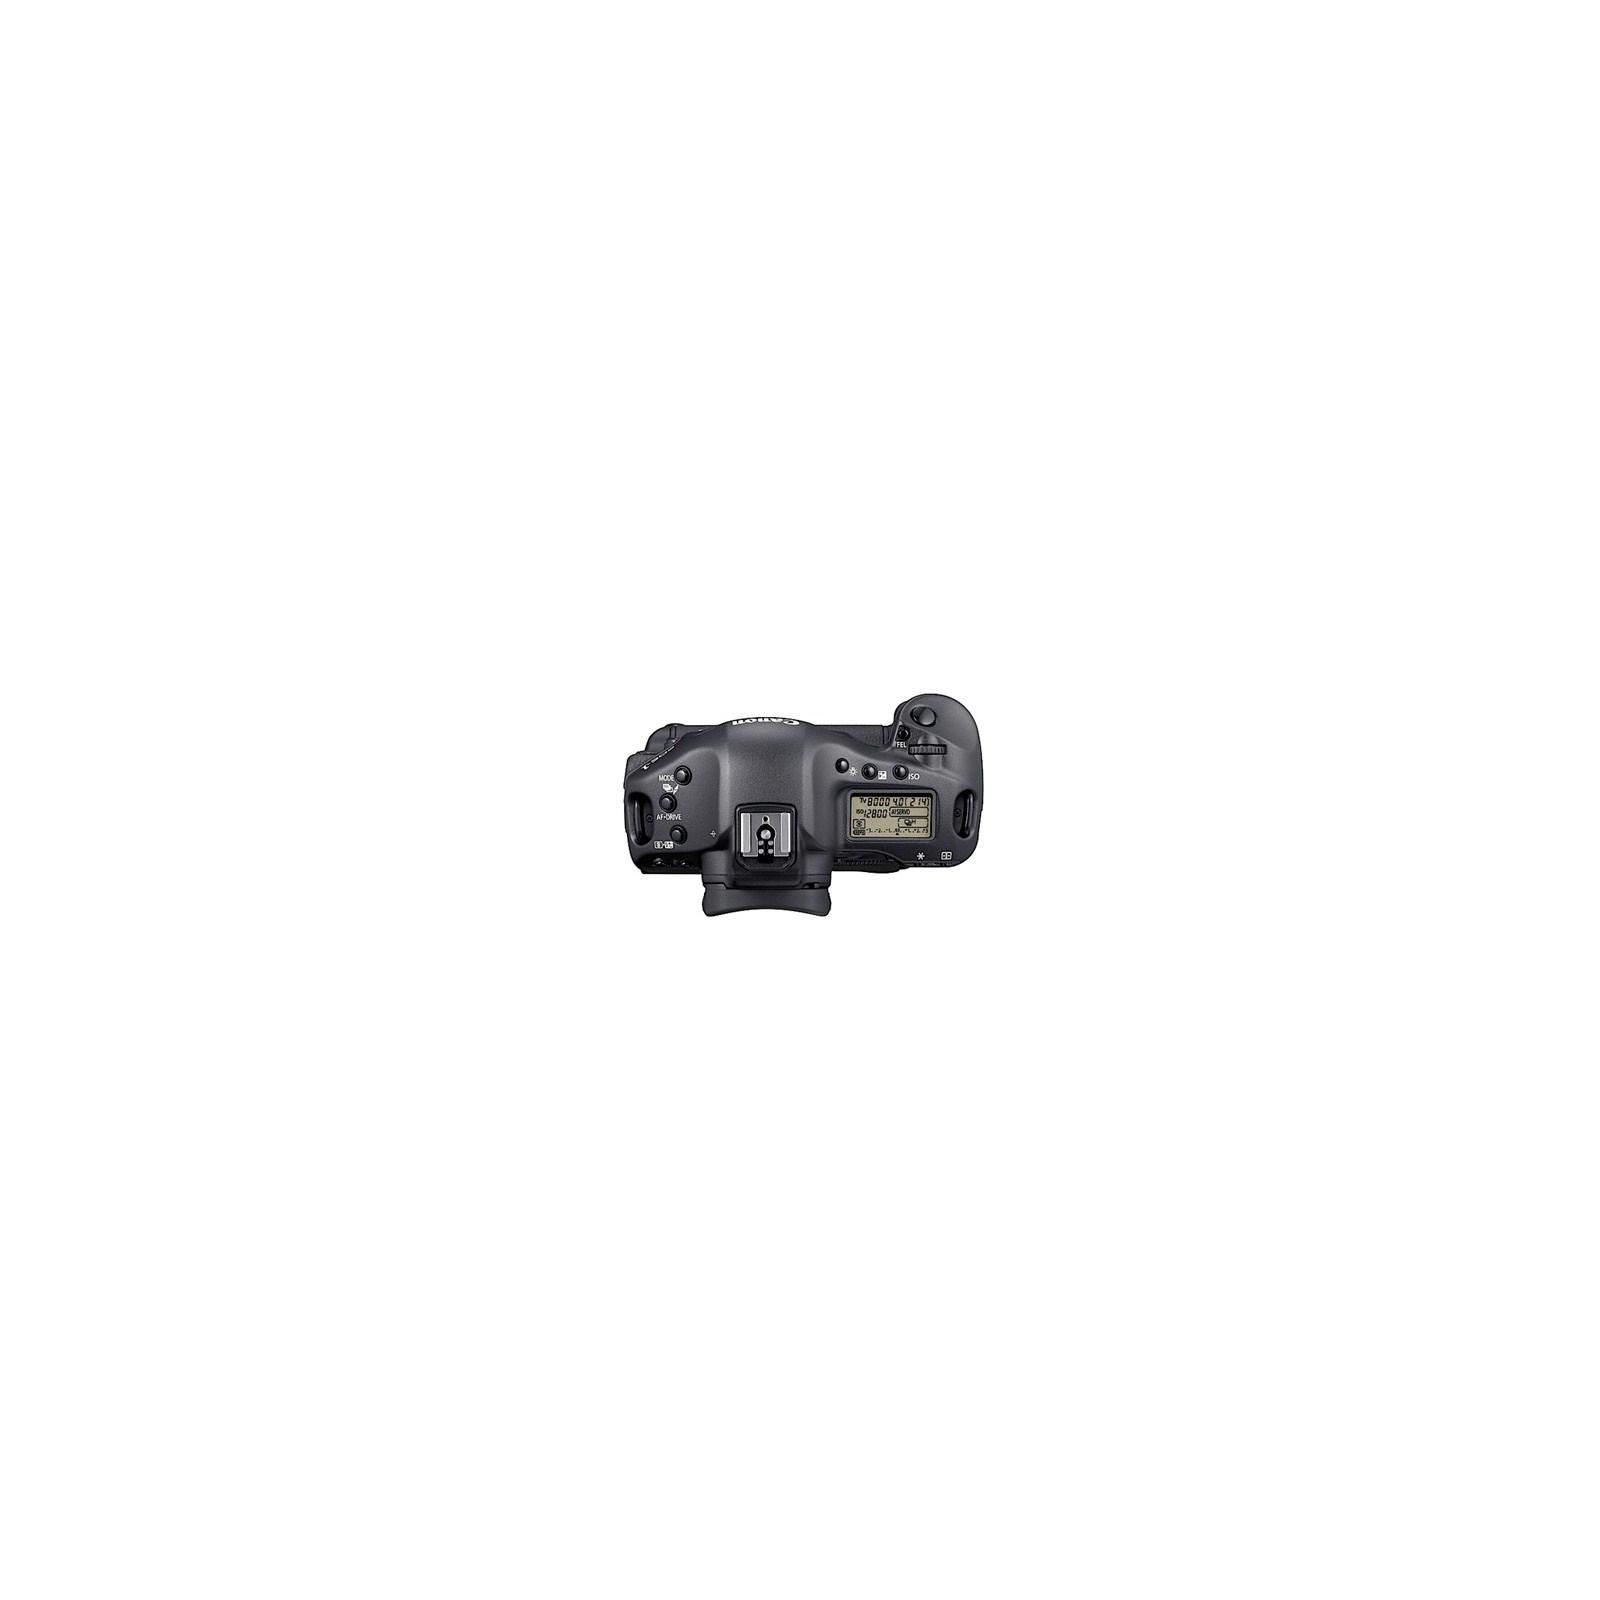 Цифровой фотоаппарат EOS 1D Mark IV body Canon (3822B020) изображение 3